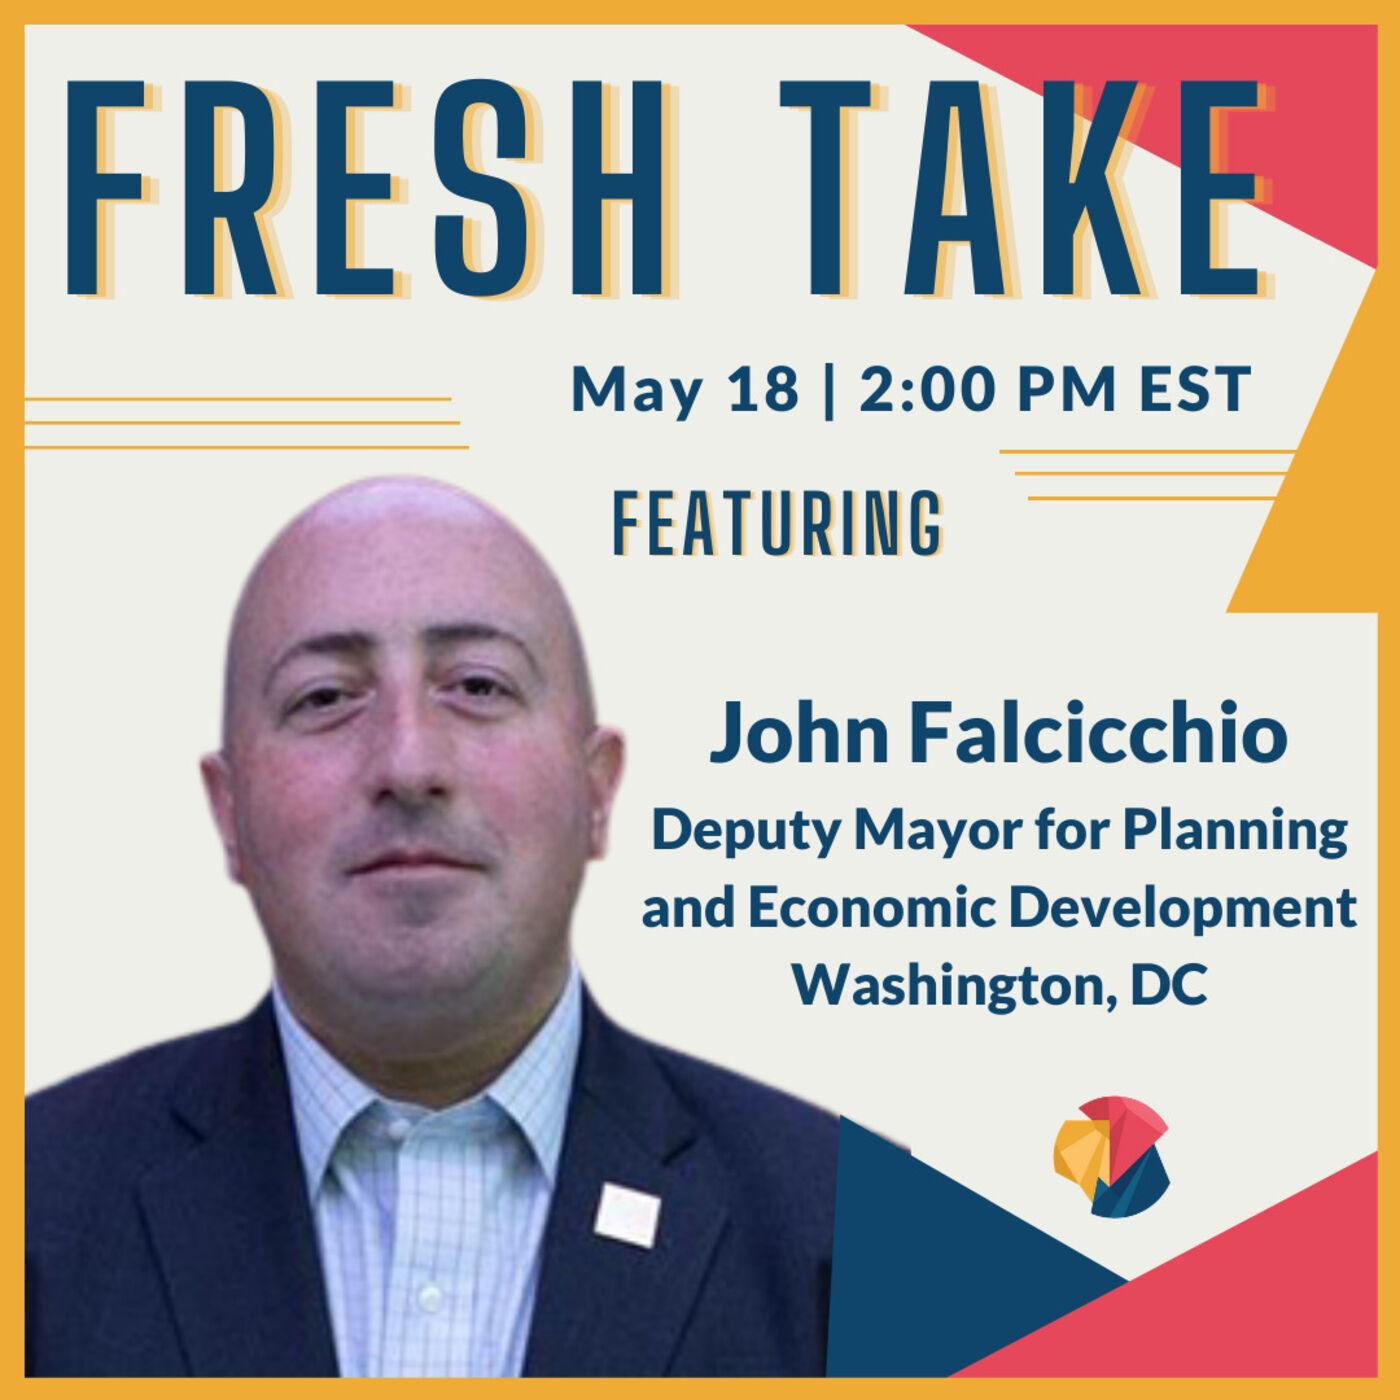 Fresh Take ft. John Falcicchio